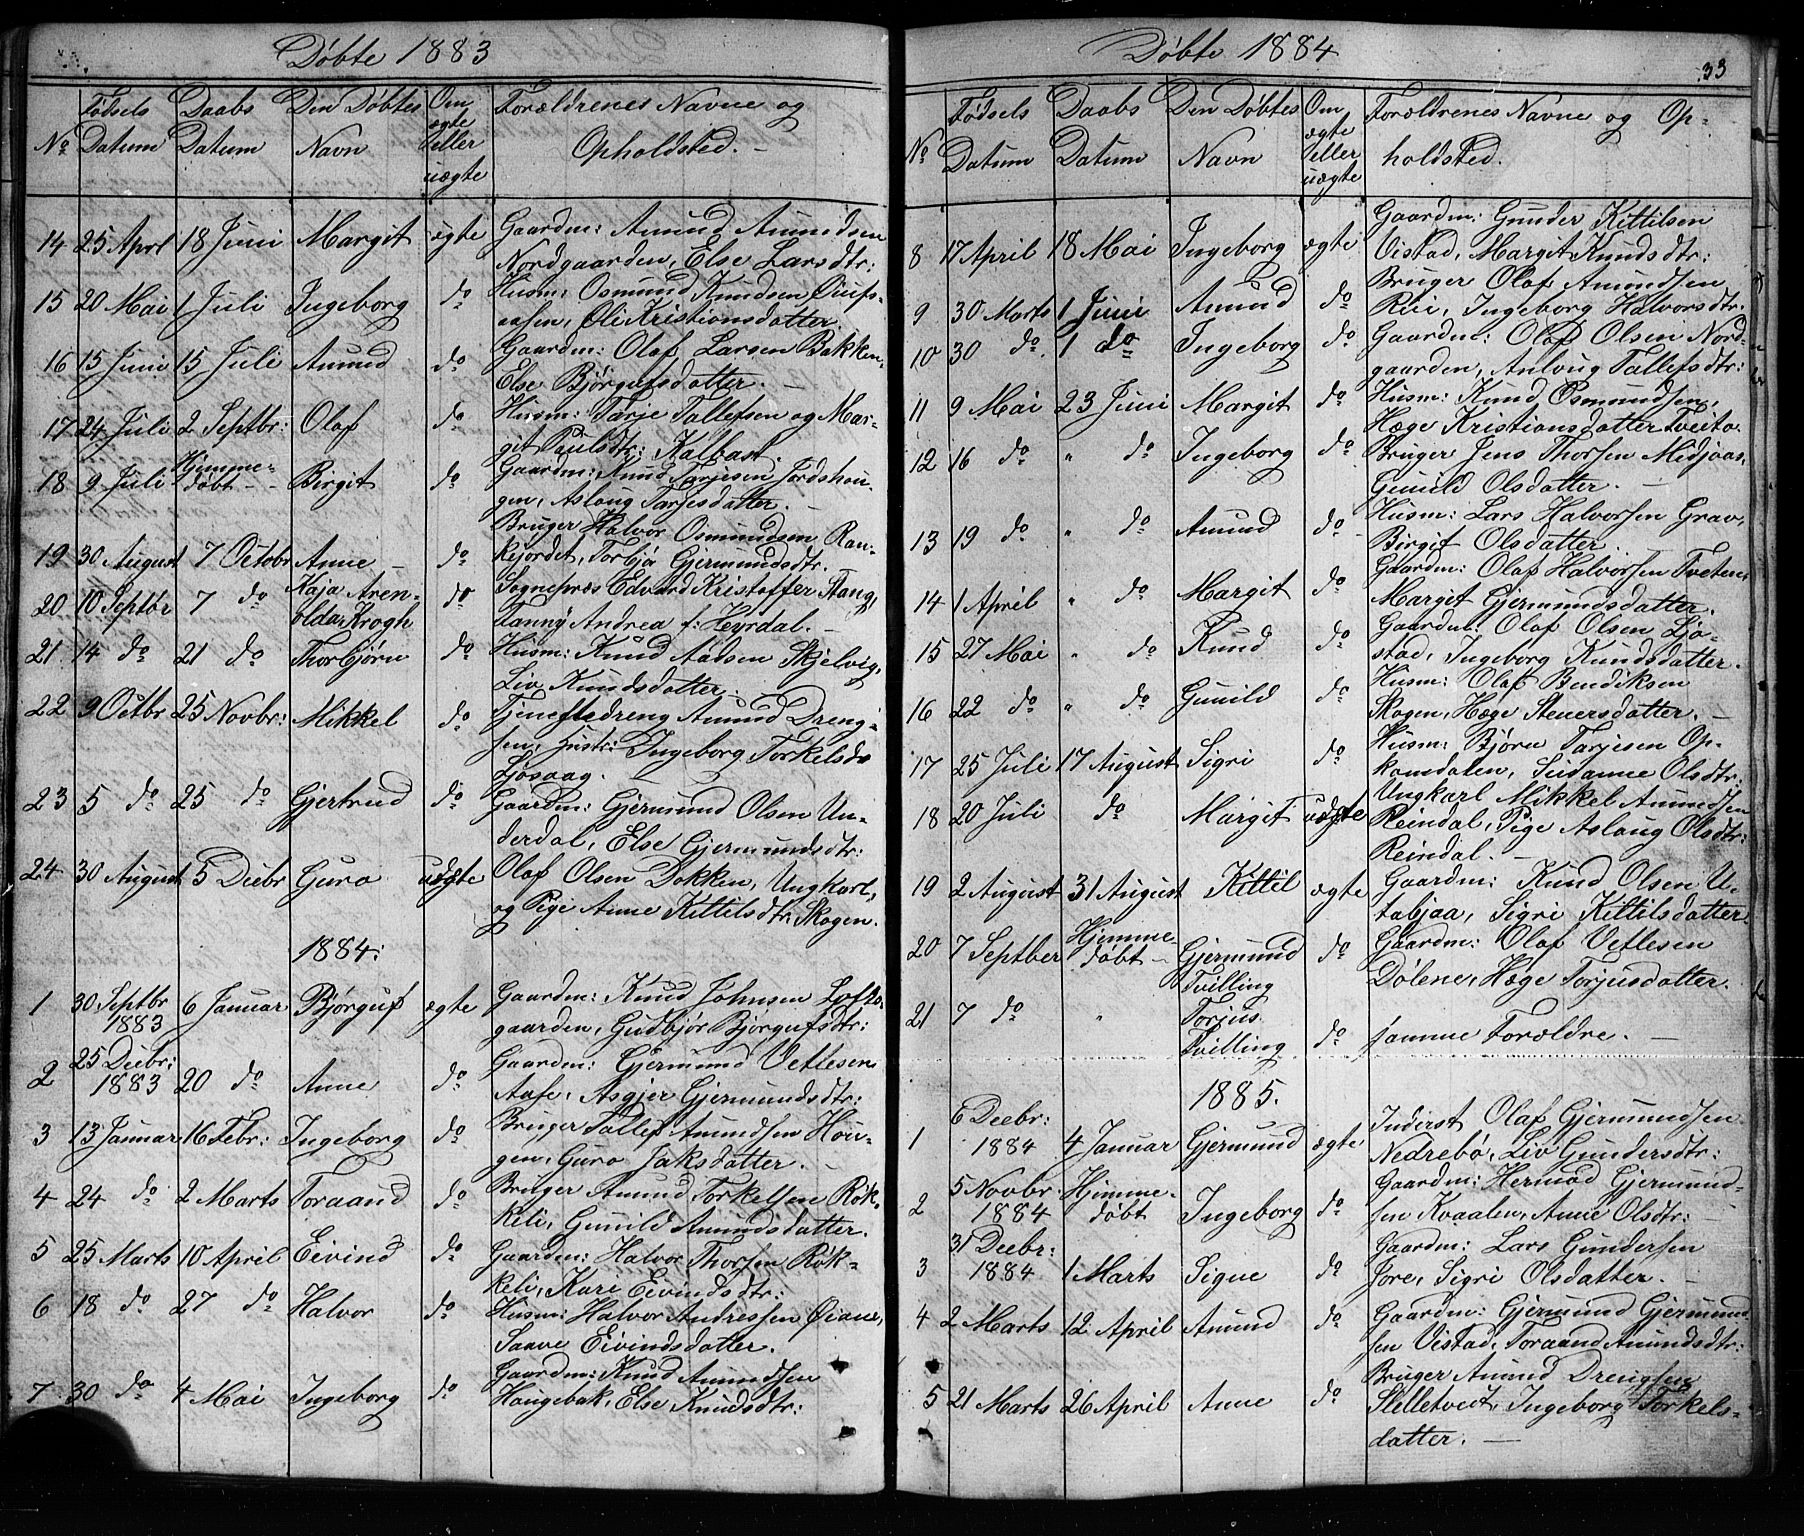 SAKO, Mo kirkebøker, G/Ga/L0001: Klokkerbok nr. I 1, 1851-1891, s. 33